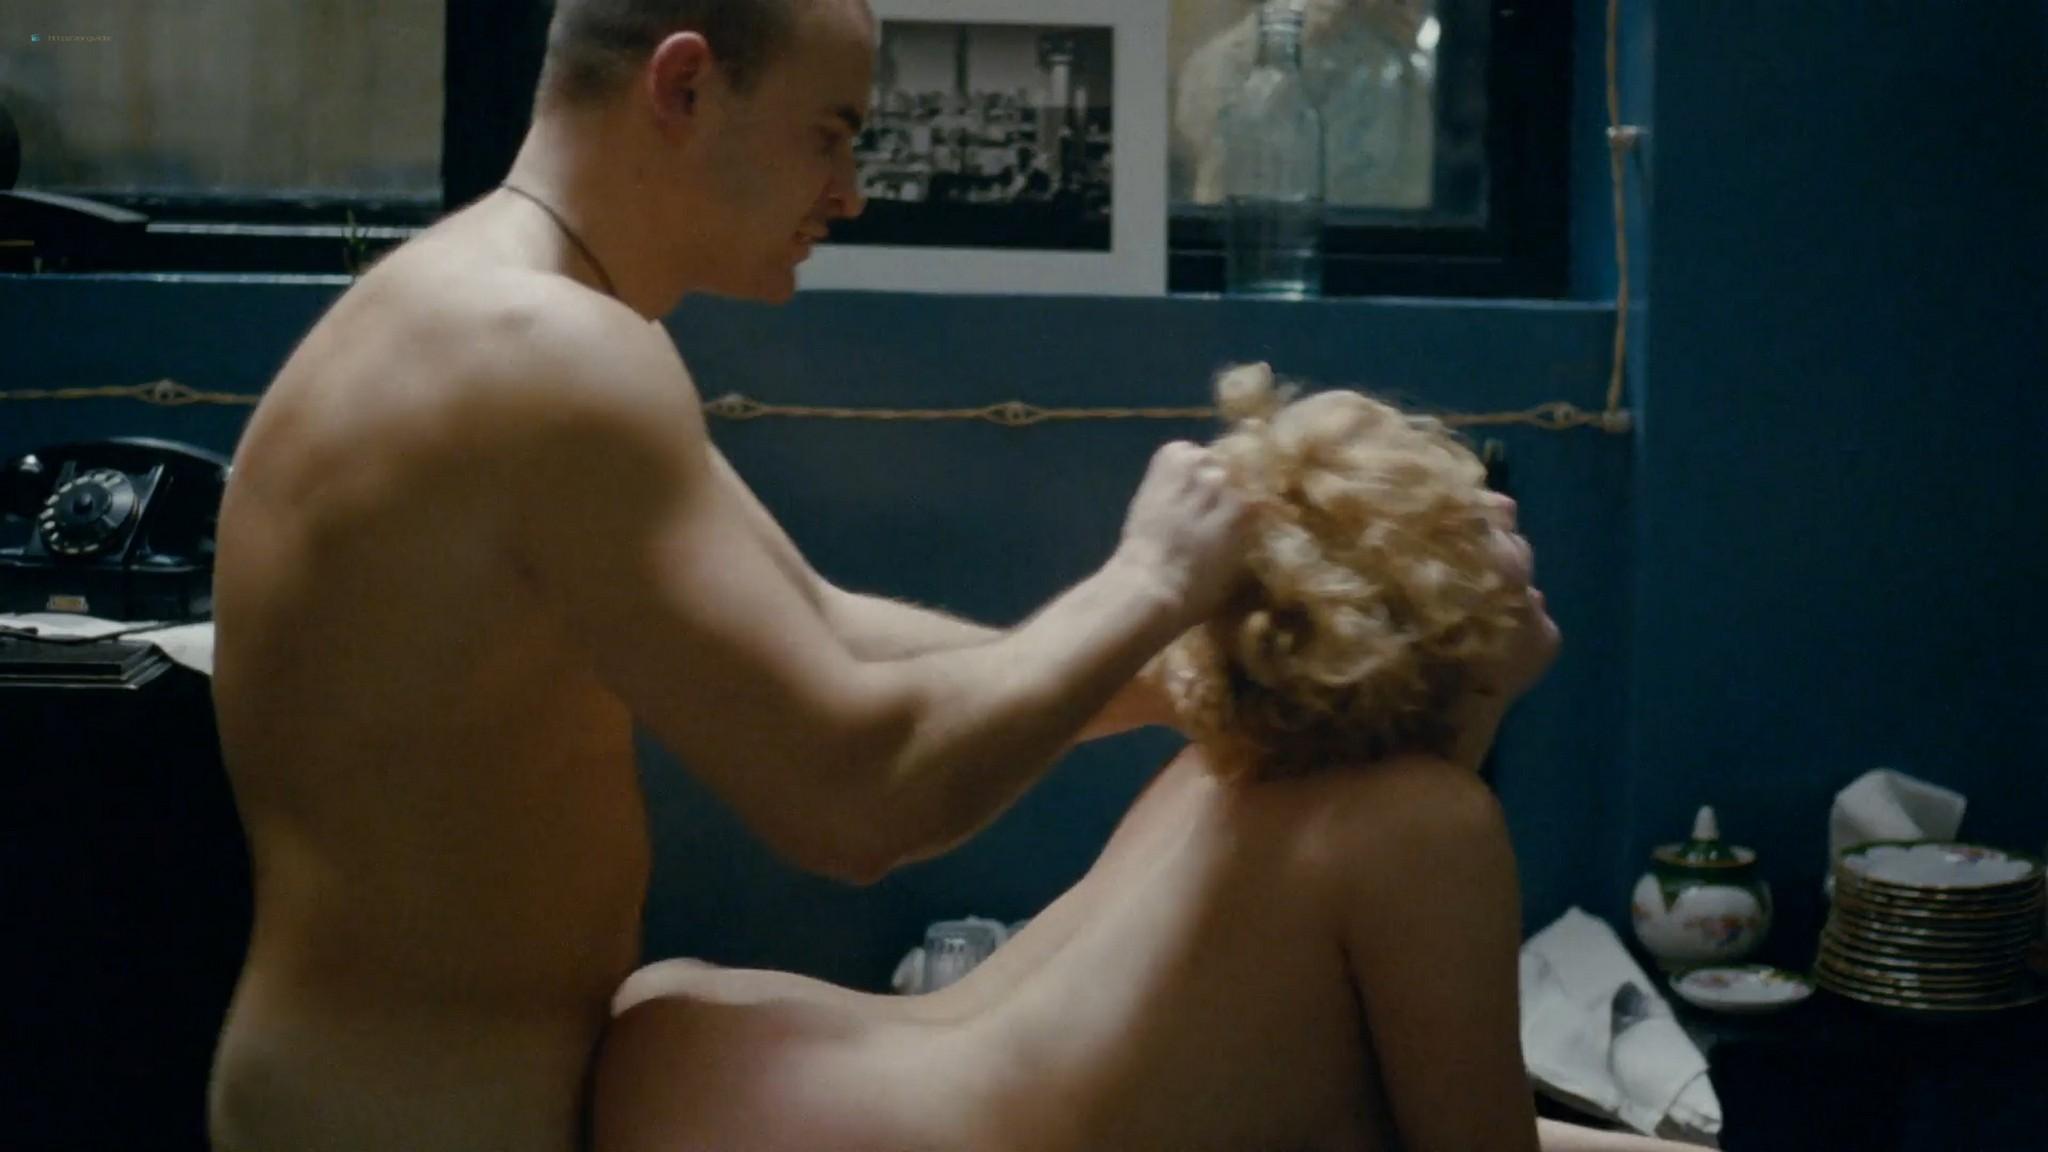 Kristina Babich nude sex Viktoria Skitskaya, Kristina Voloshina nude too- DAU Degeneratsiya (2020) HD 1080p (7)